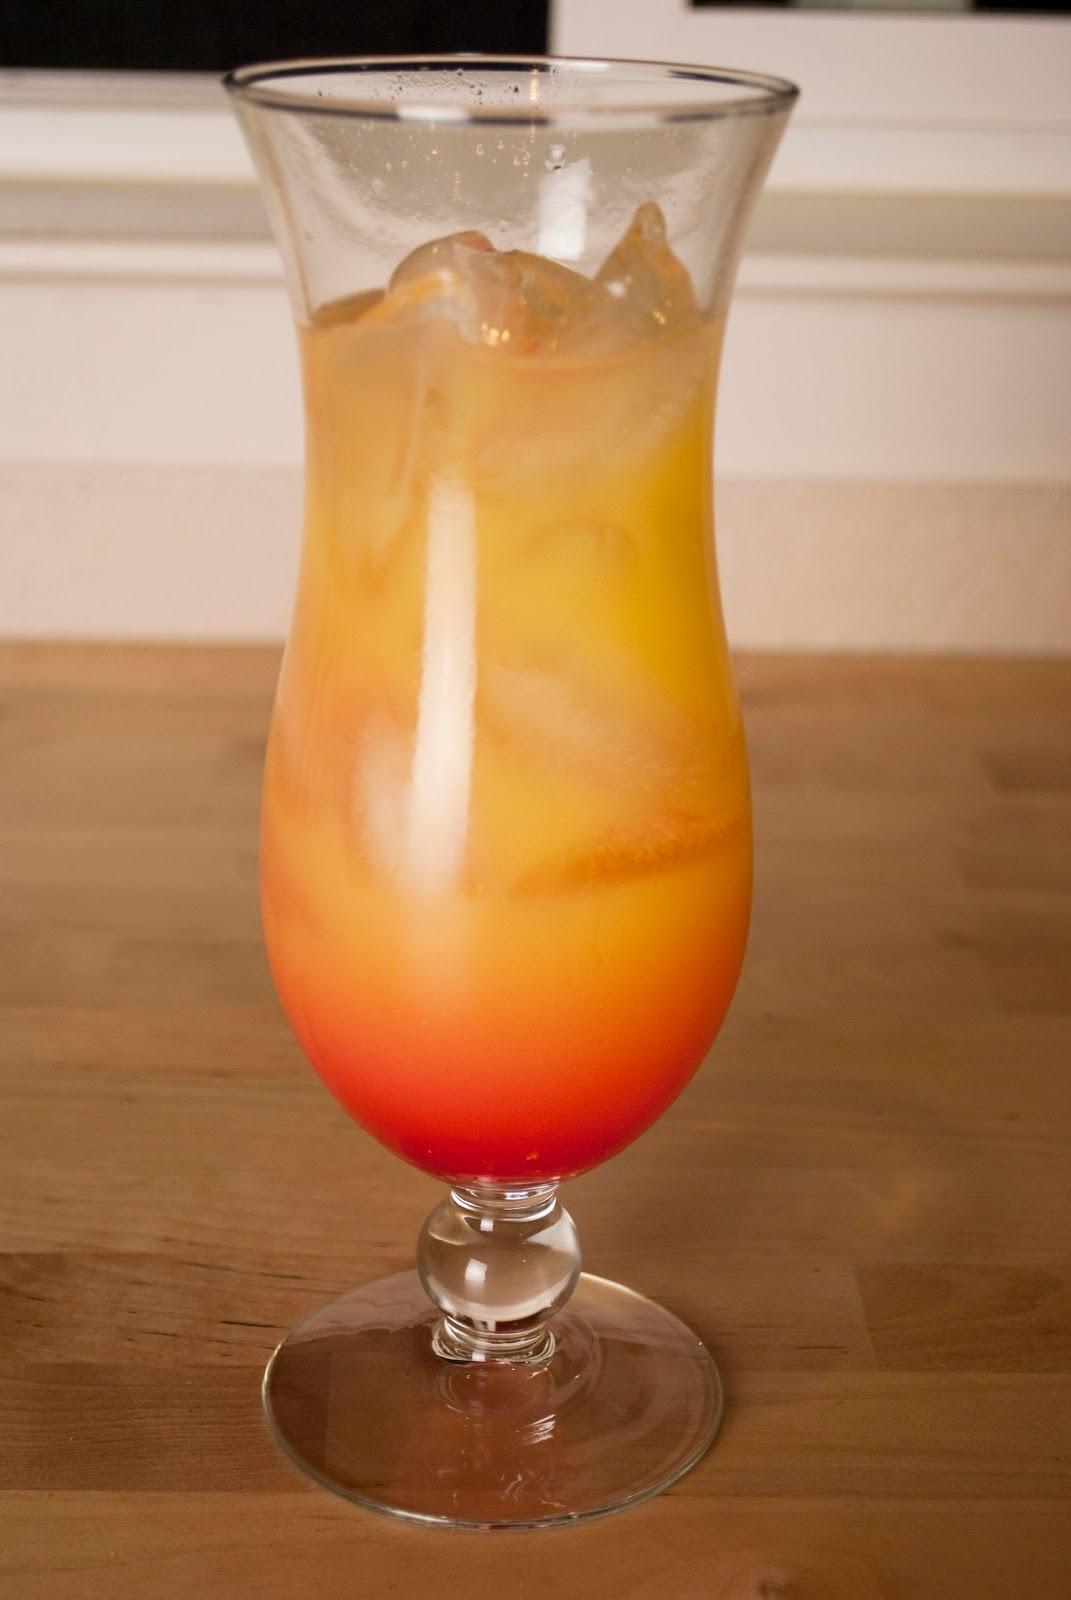 Good Drinks To Mix With Malibu Rum